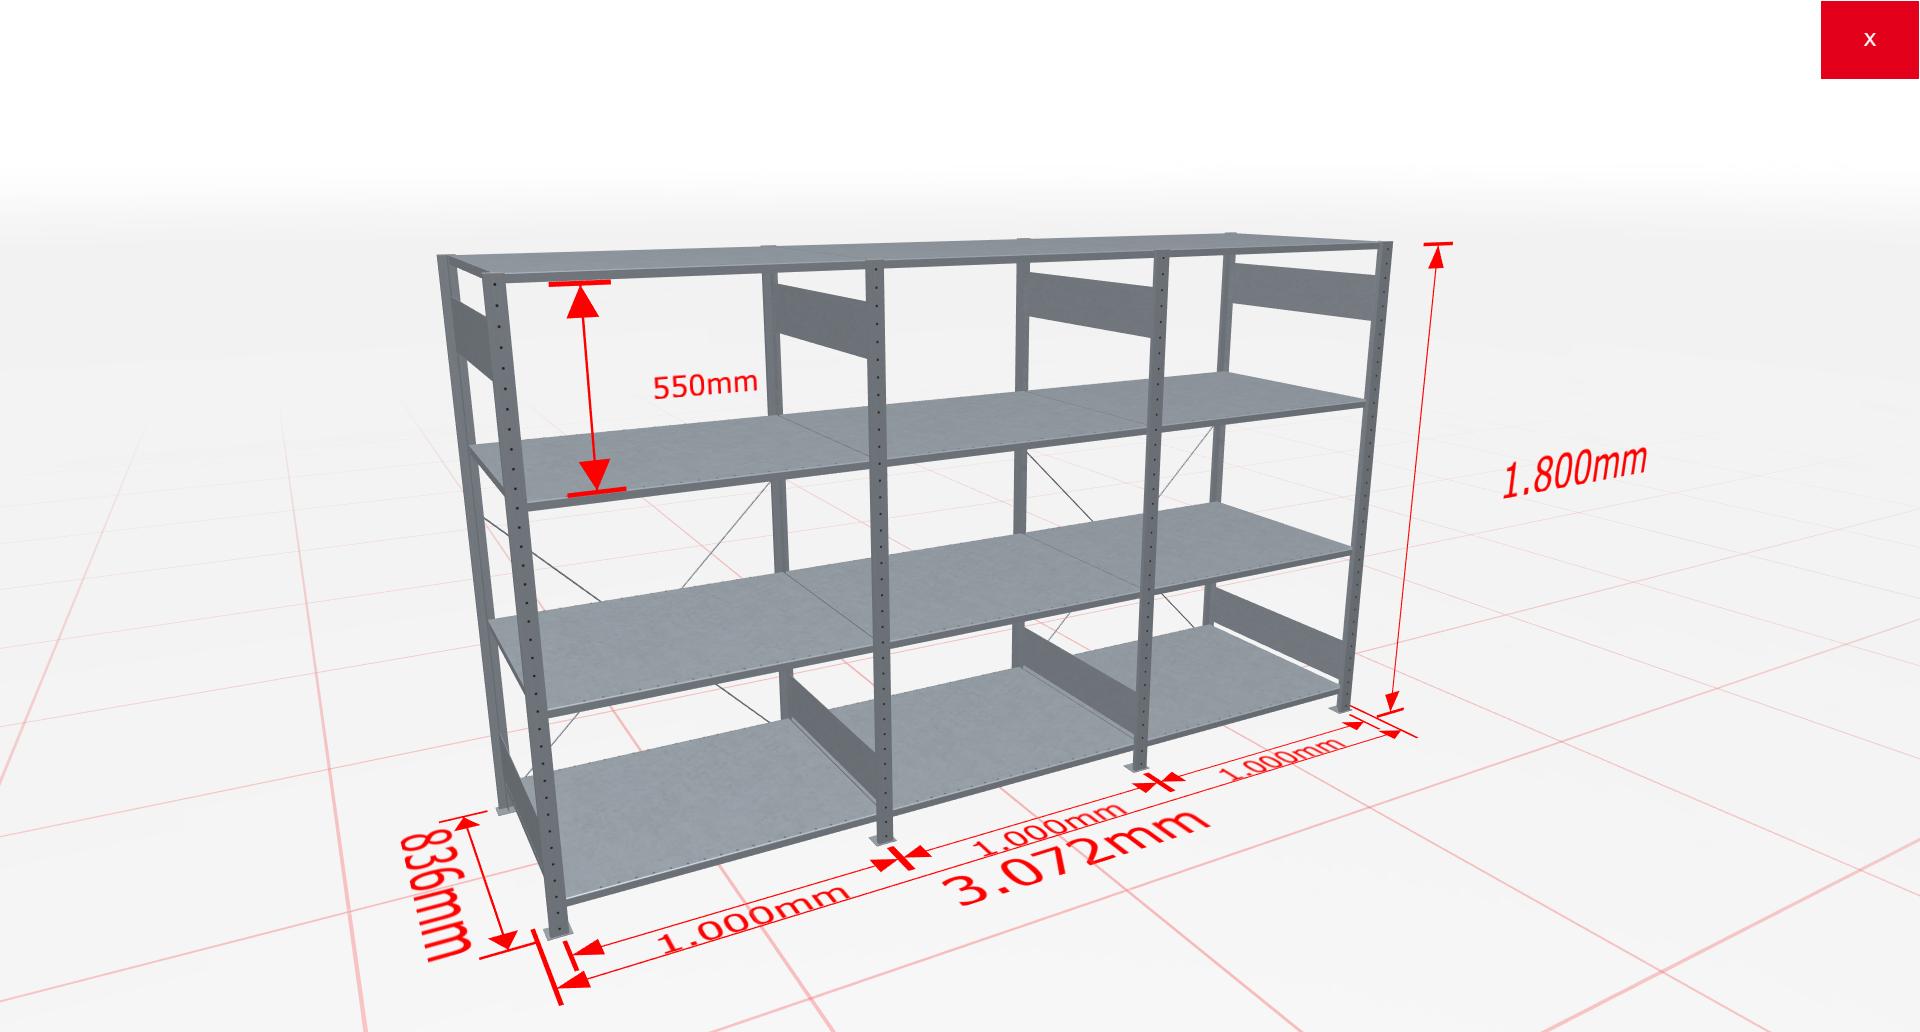 Fachbodenregal Komplettregal 1800x3072x800 mm (HxBxT) SCHULTE Lagertechnik verzinkt 4 Ebenen  150 kg je Boden